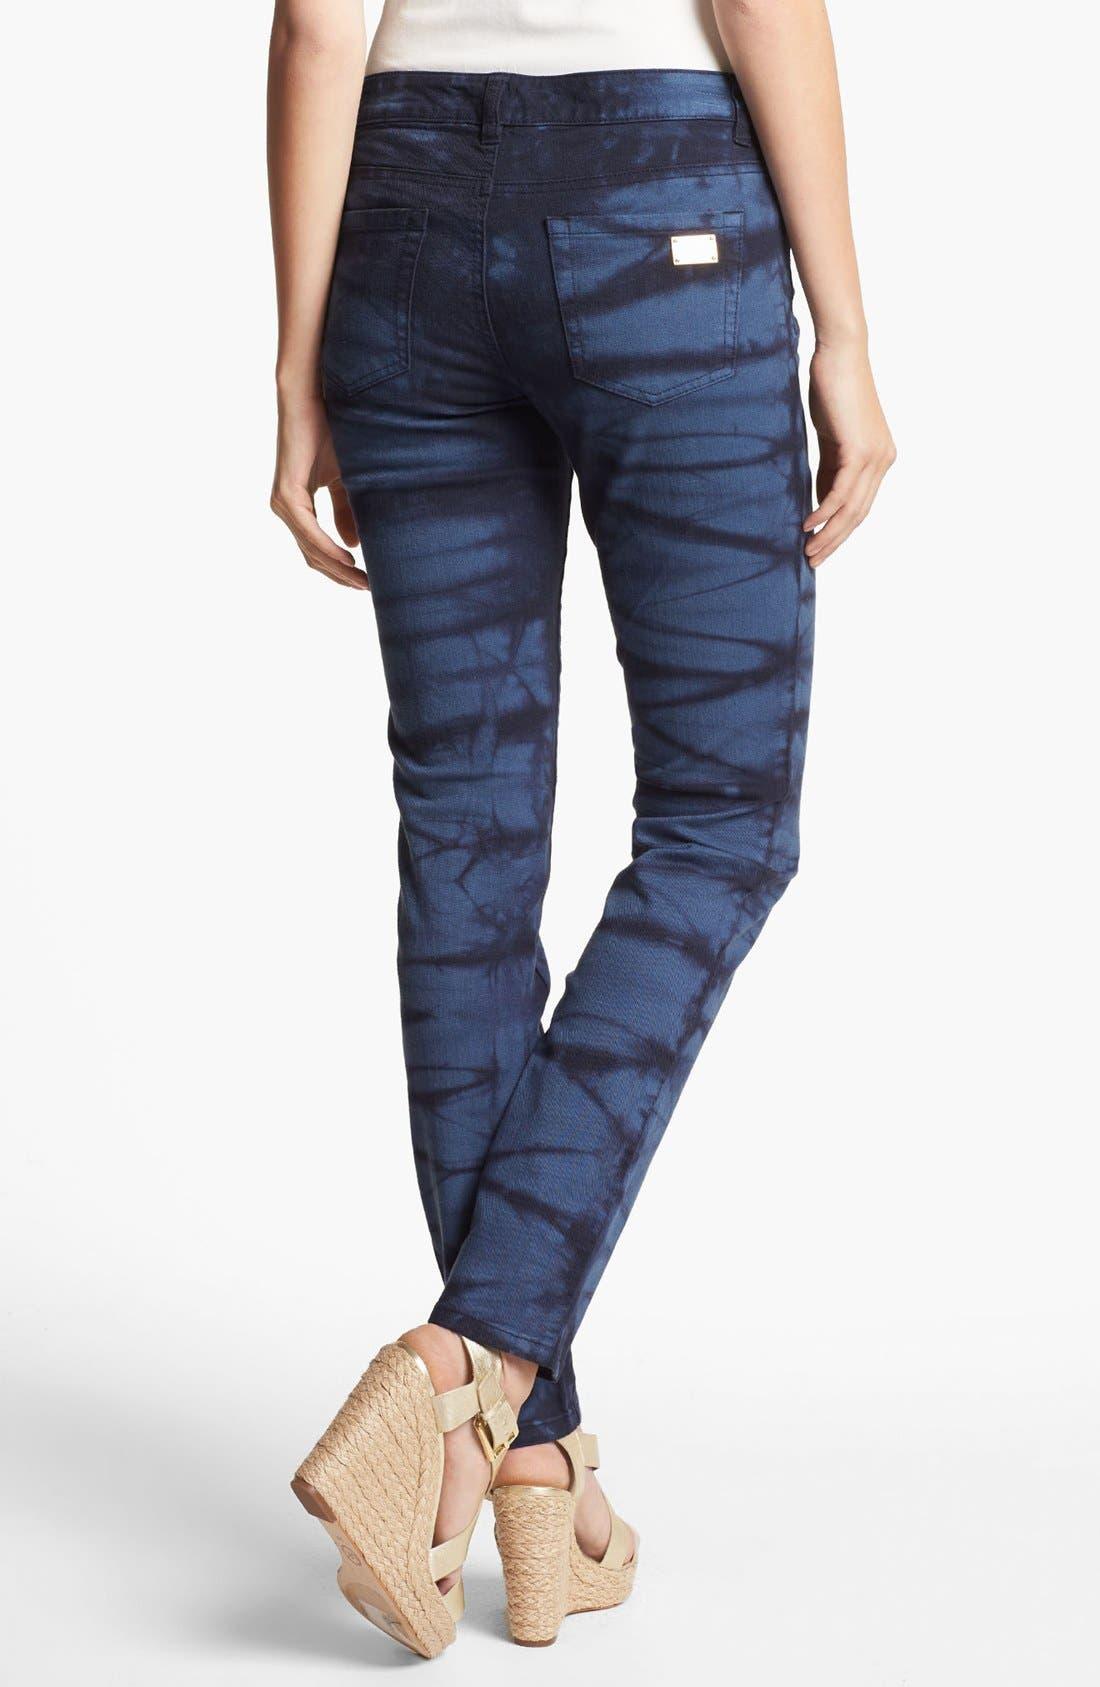 Alternate Image 1 Selected - MICHAEL Michael Kors Tie Dye Print Jeans (Petite)